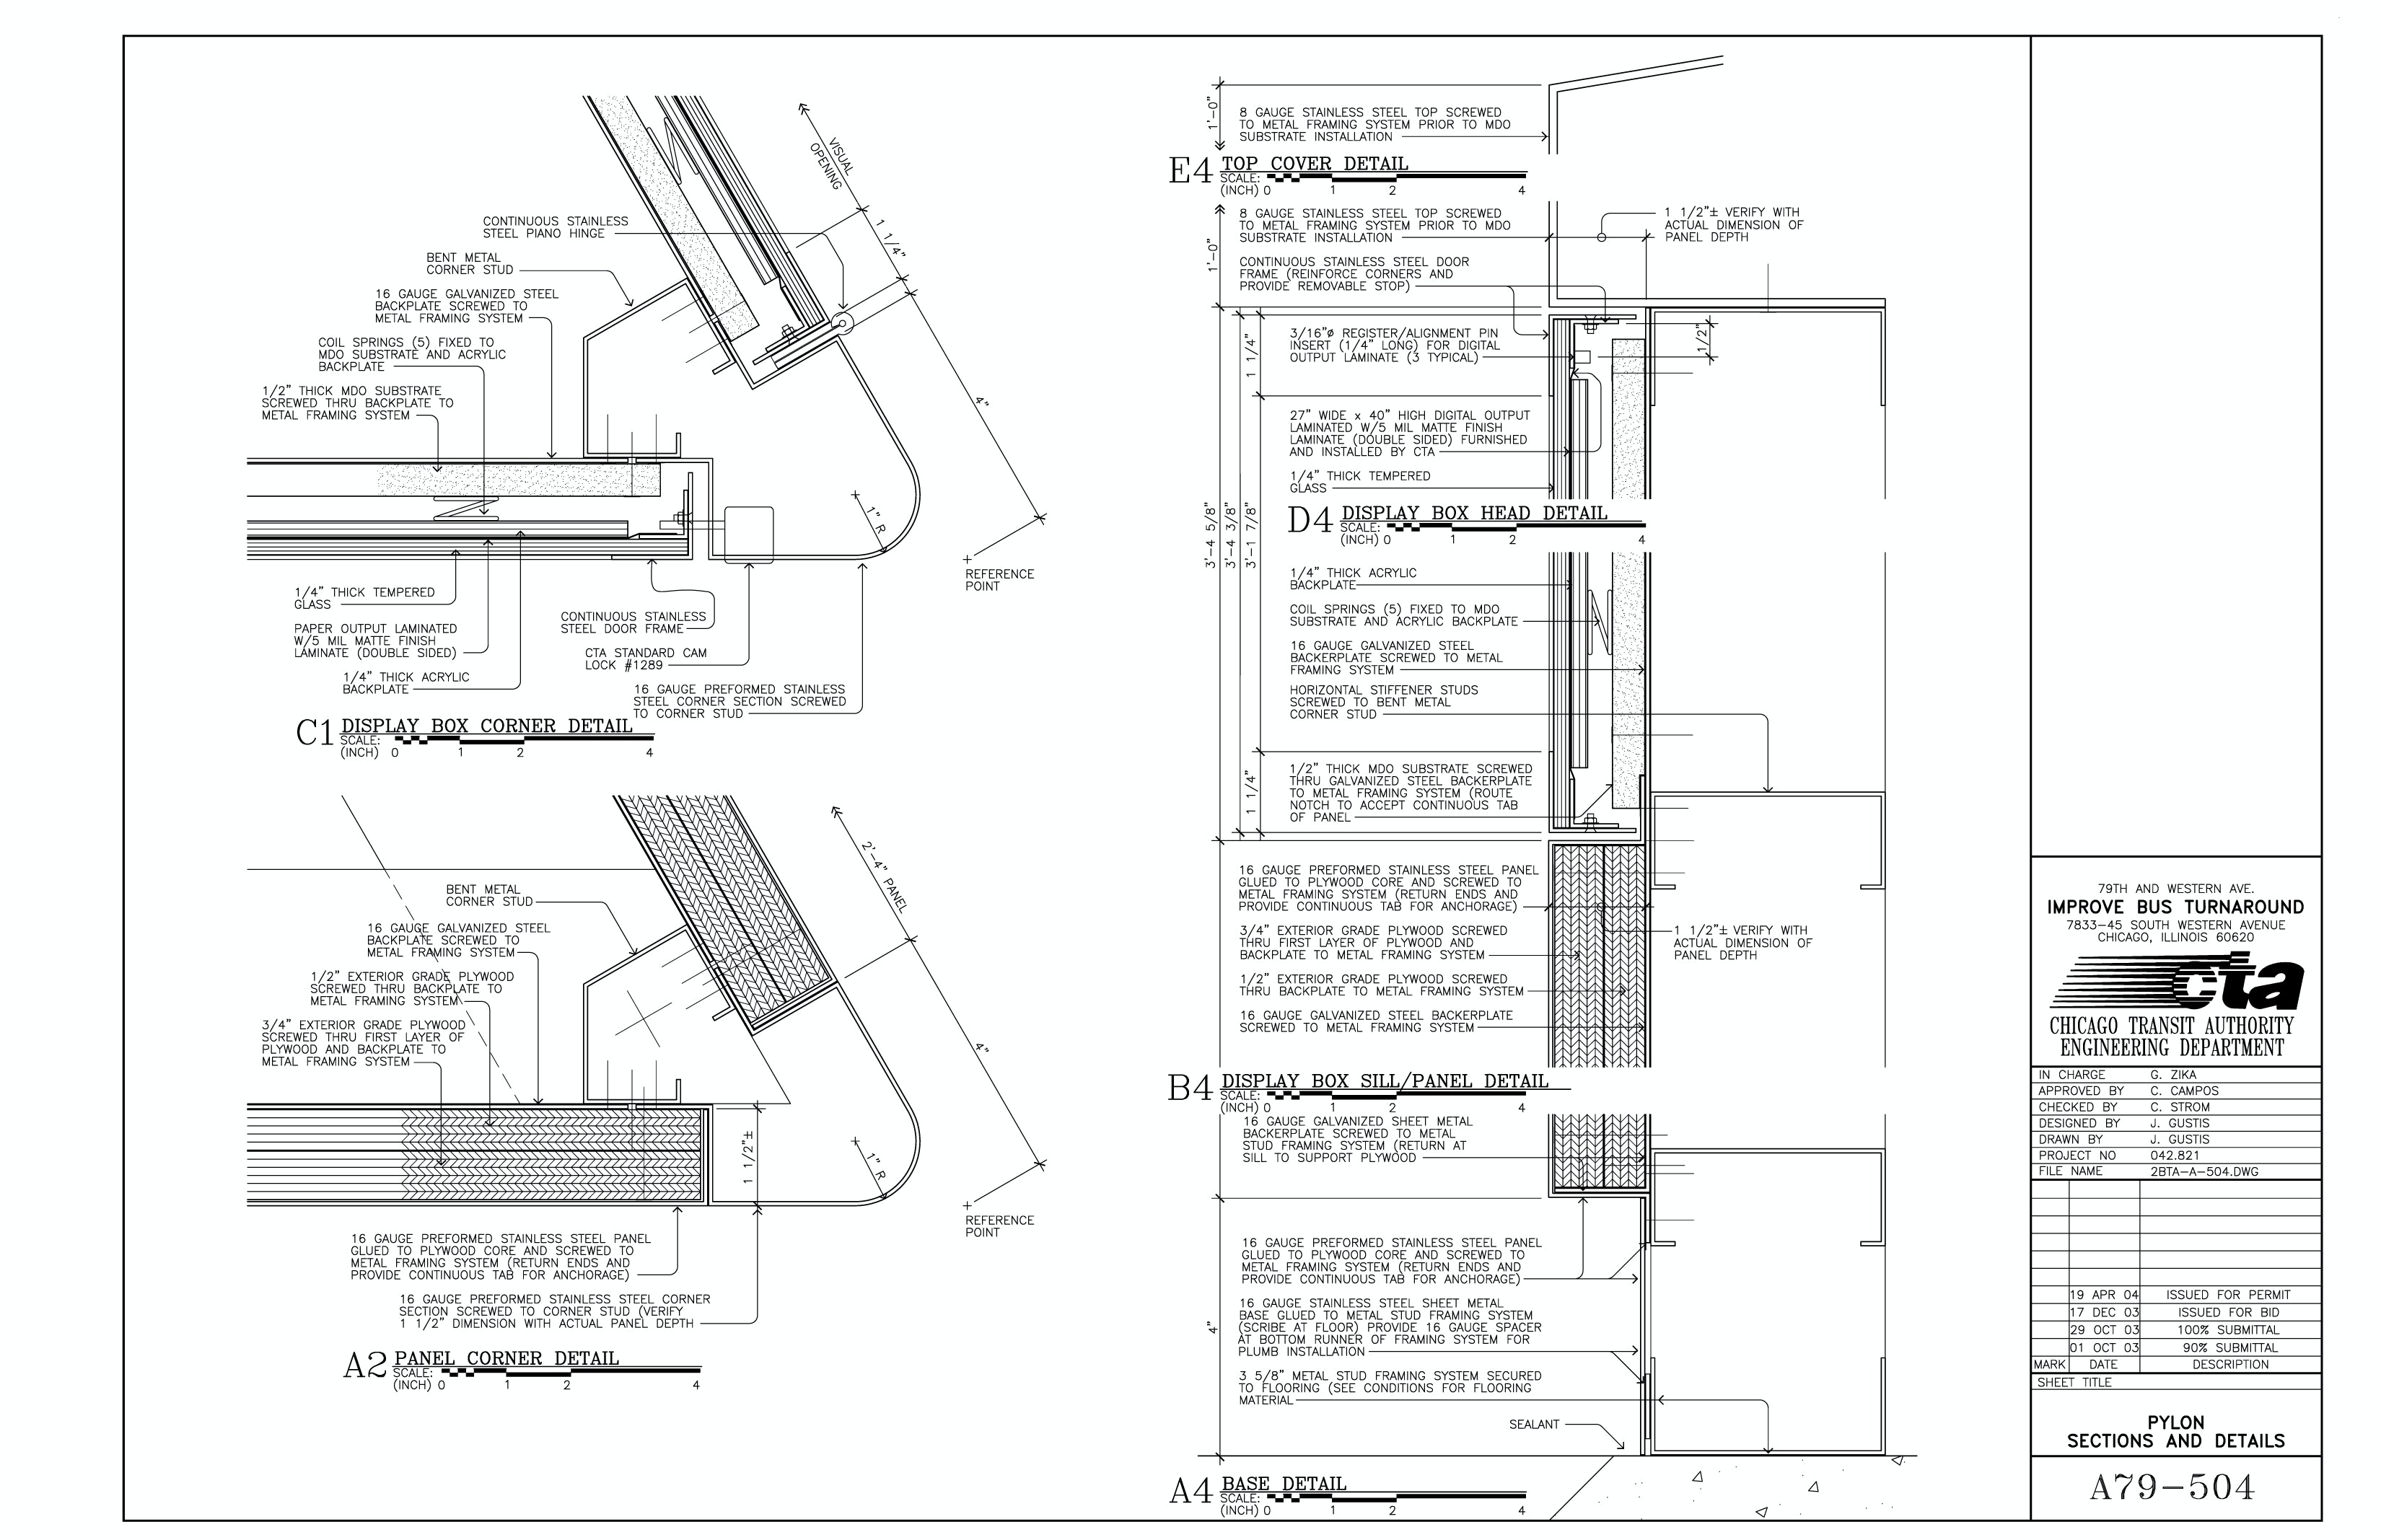 21mpiaubf38nc952?auto\=compress%2Cformat 795h wiring diagram chevy wiring schematics \u2022 wiring diagrams j 3m opticom wiring diagram at eliteediting.co